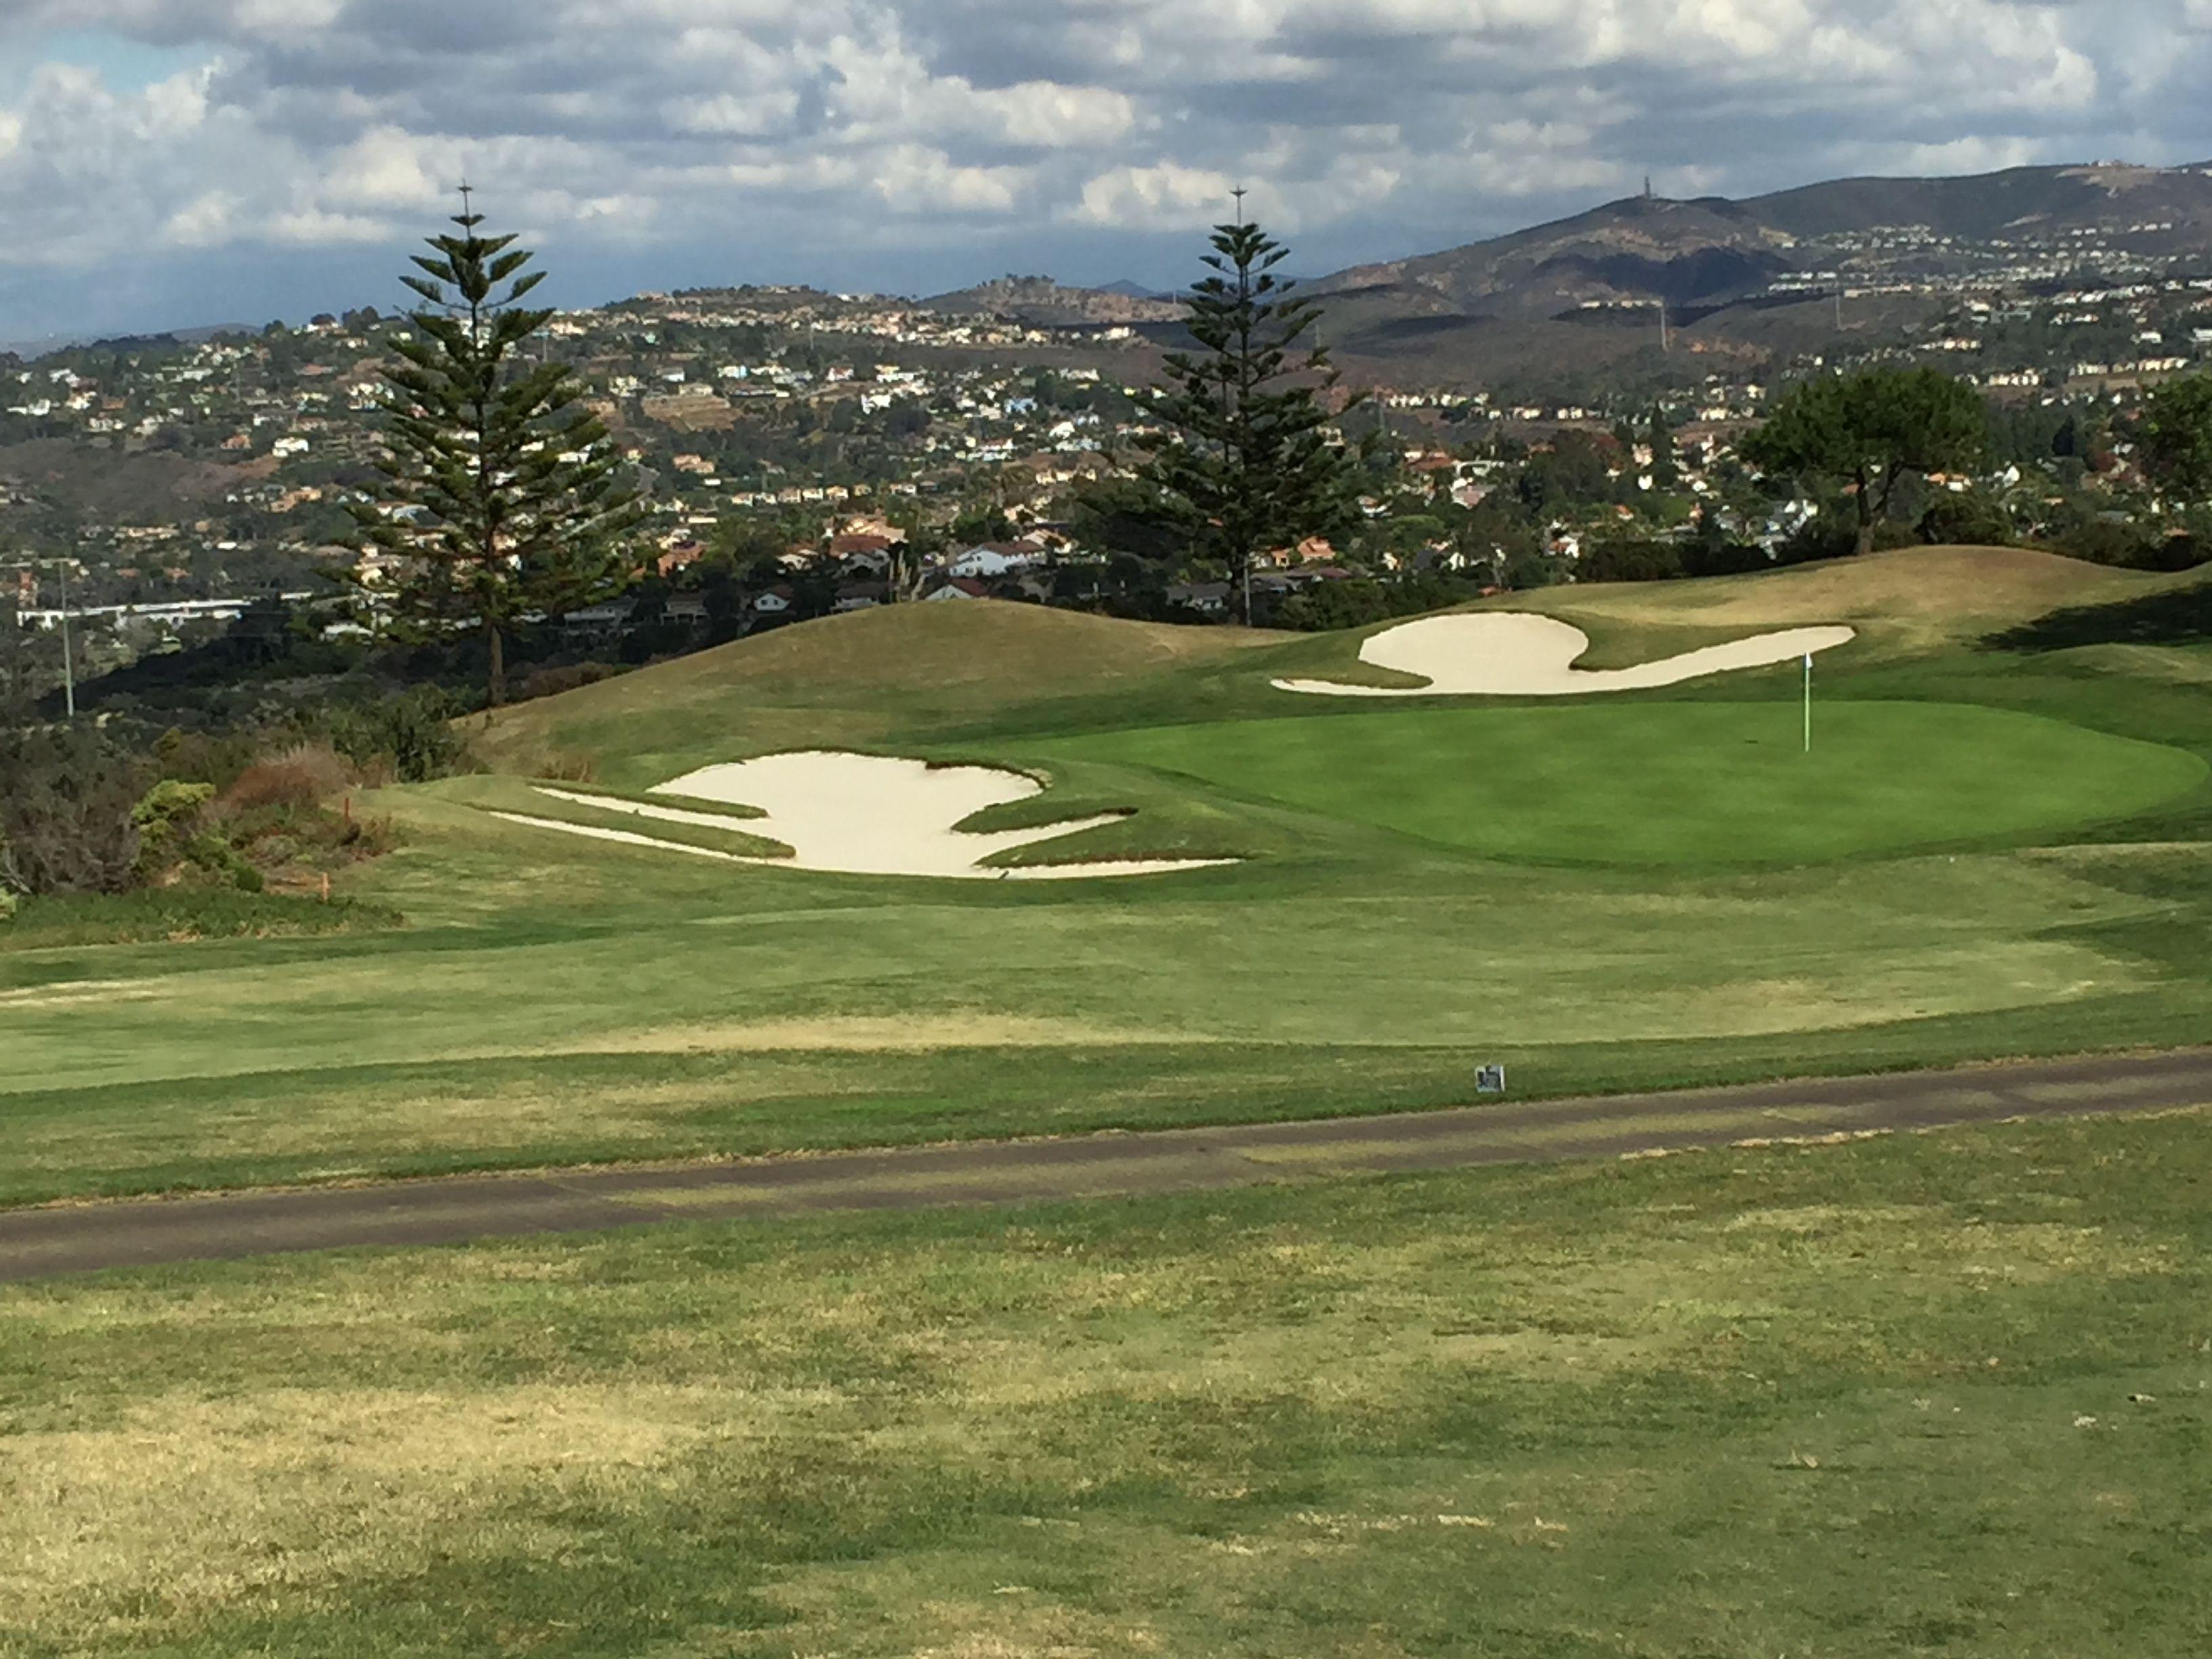 39+ Bandit golf tee times information